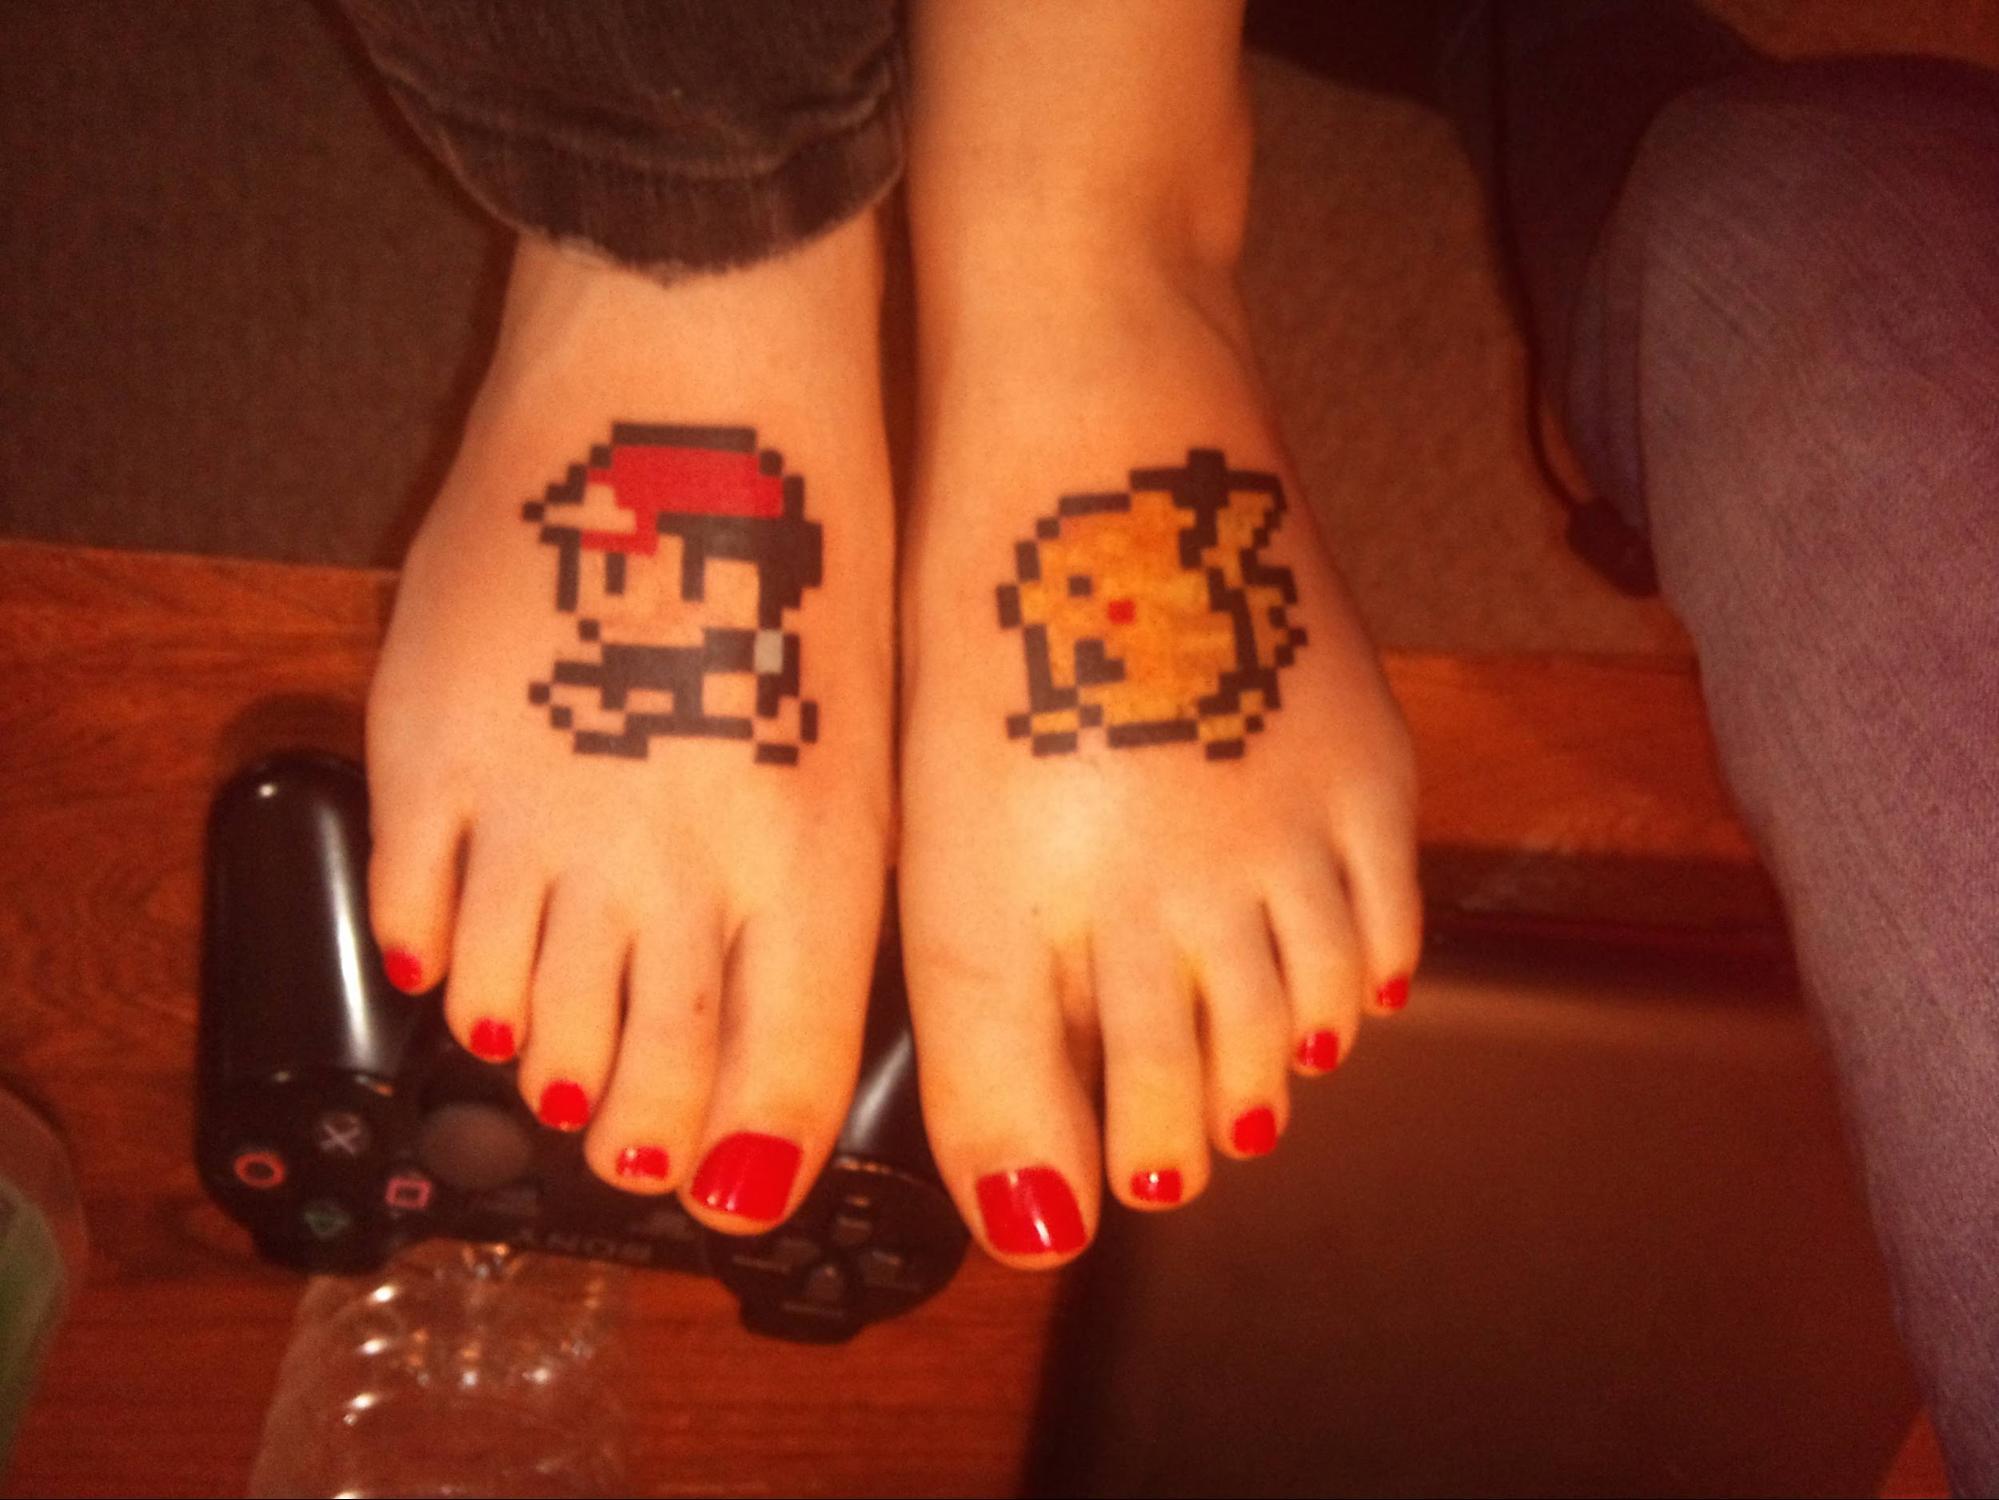 Gamer Girl Toes [DO NOT PUBLISH]